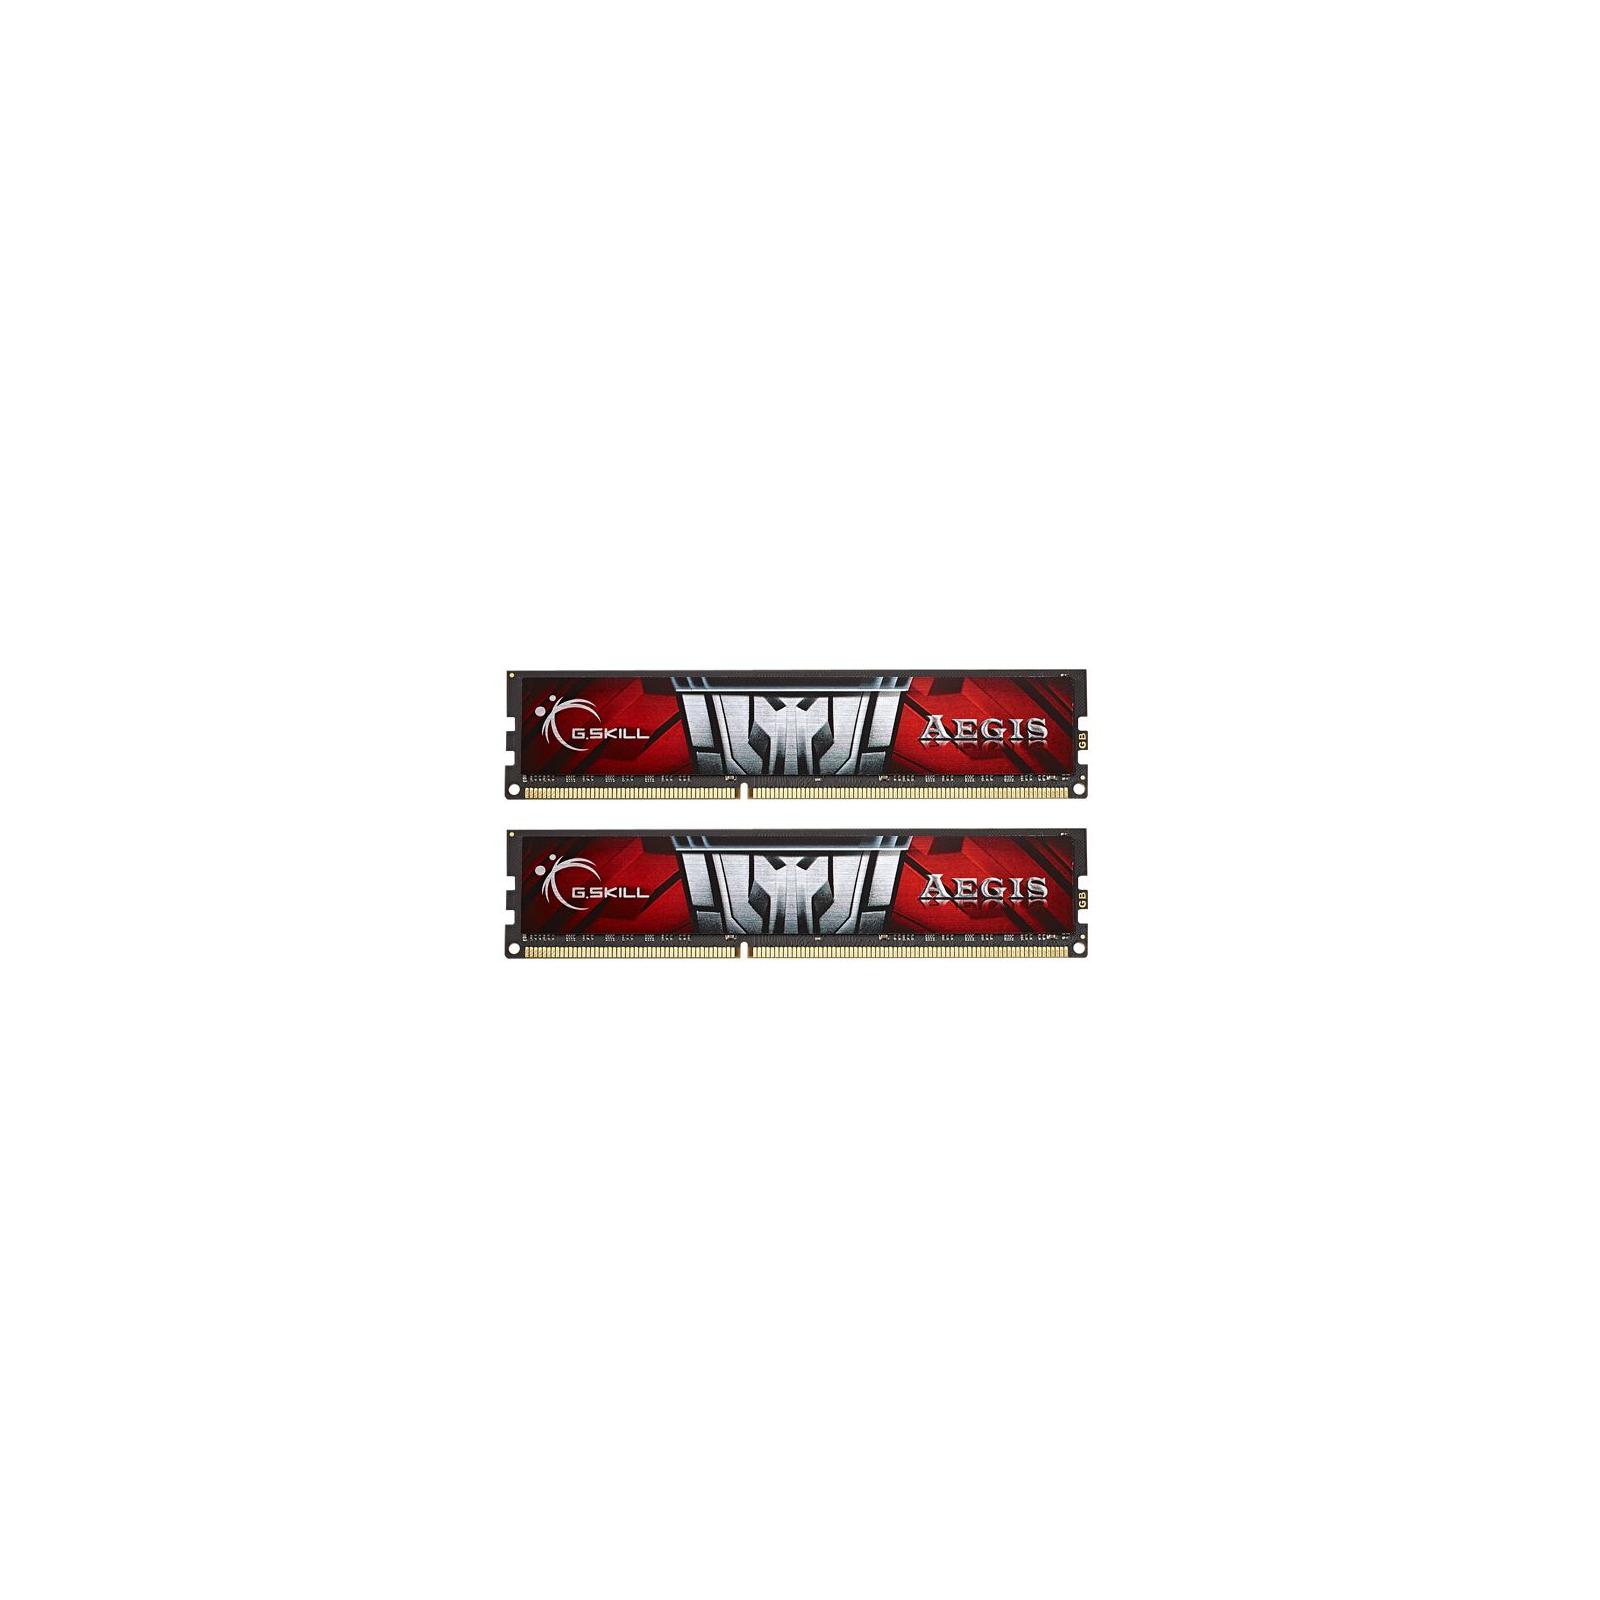 Модуль памяти для компьютера DDR3 8GB (2x4GB) 1600 MHz G.Skill (F3-1600C11D-8GIS)